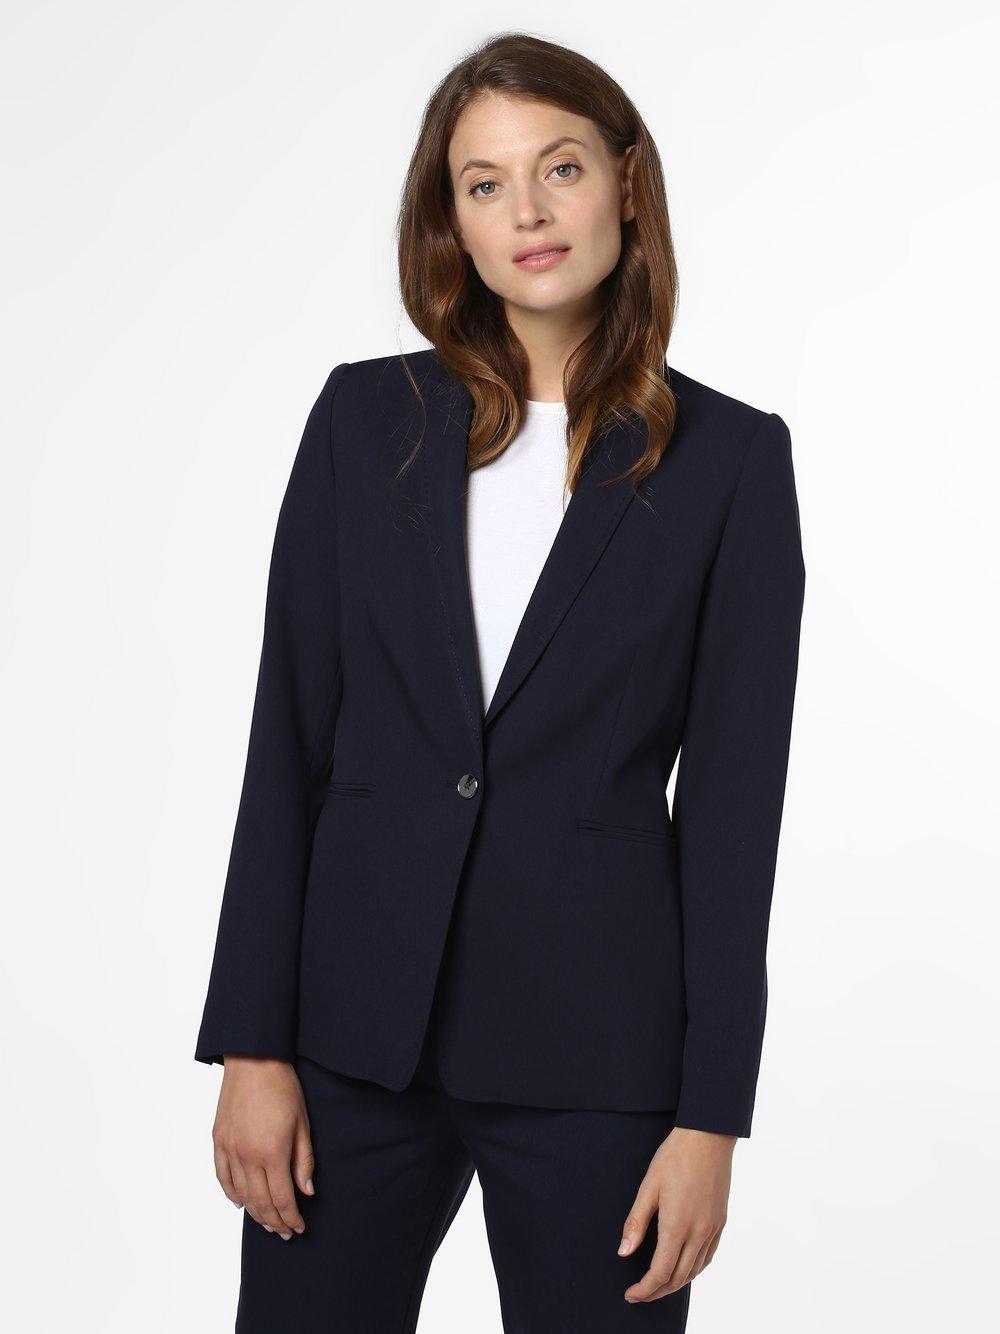 Esprit Collection – Blezer damski, niebieski Van Graaf 463763-0002-00340